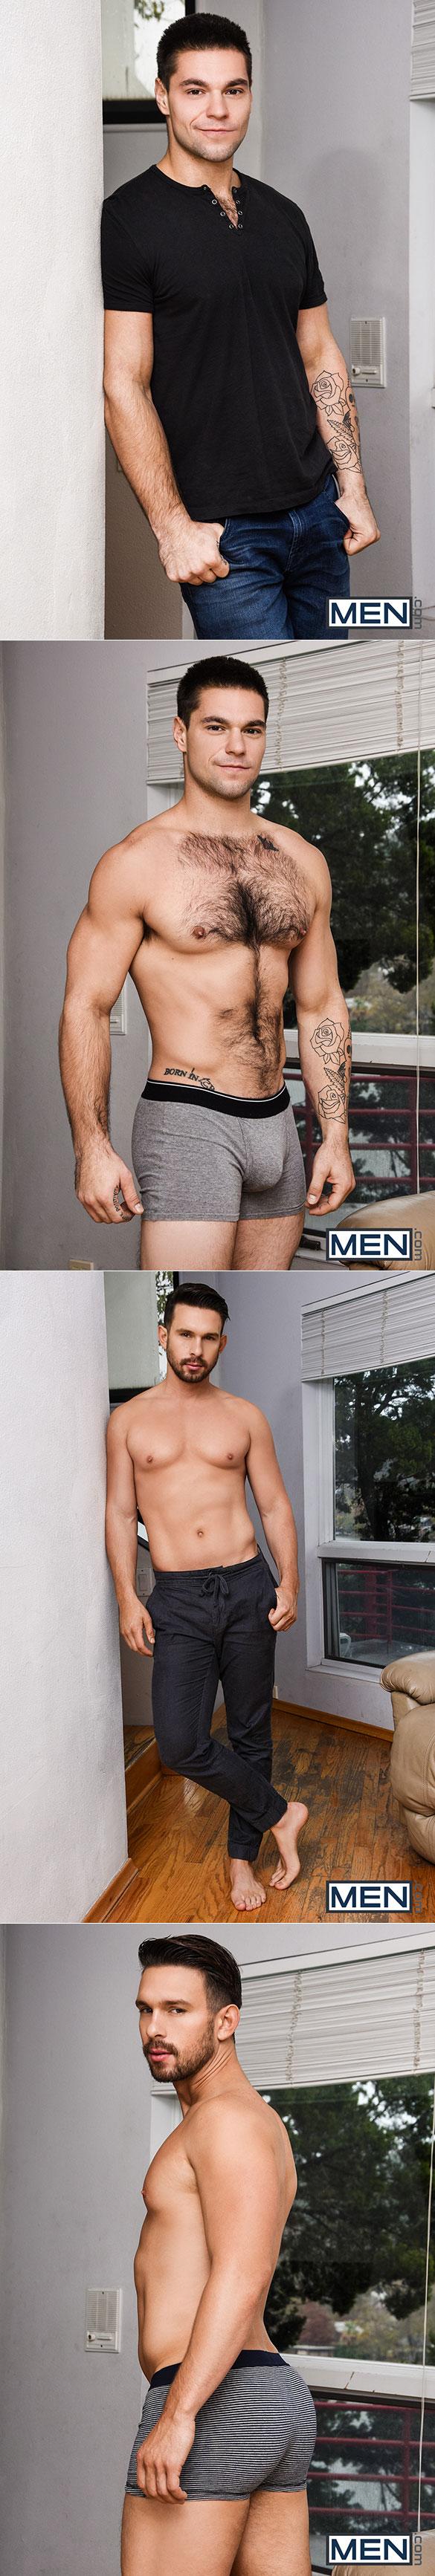 "Men.com: Aspen bangs Casey Jacks in ""Head Butt Fuck"""